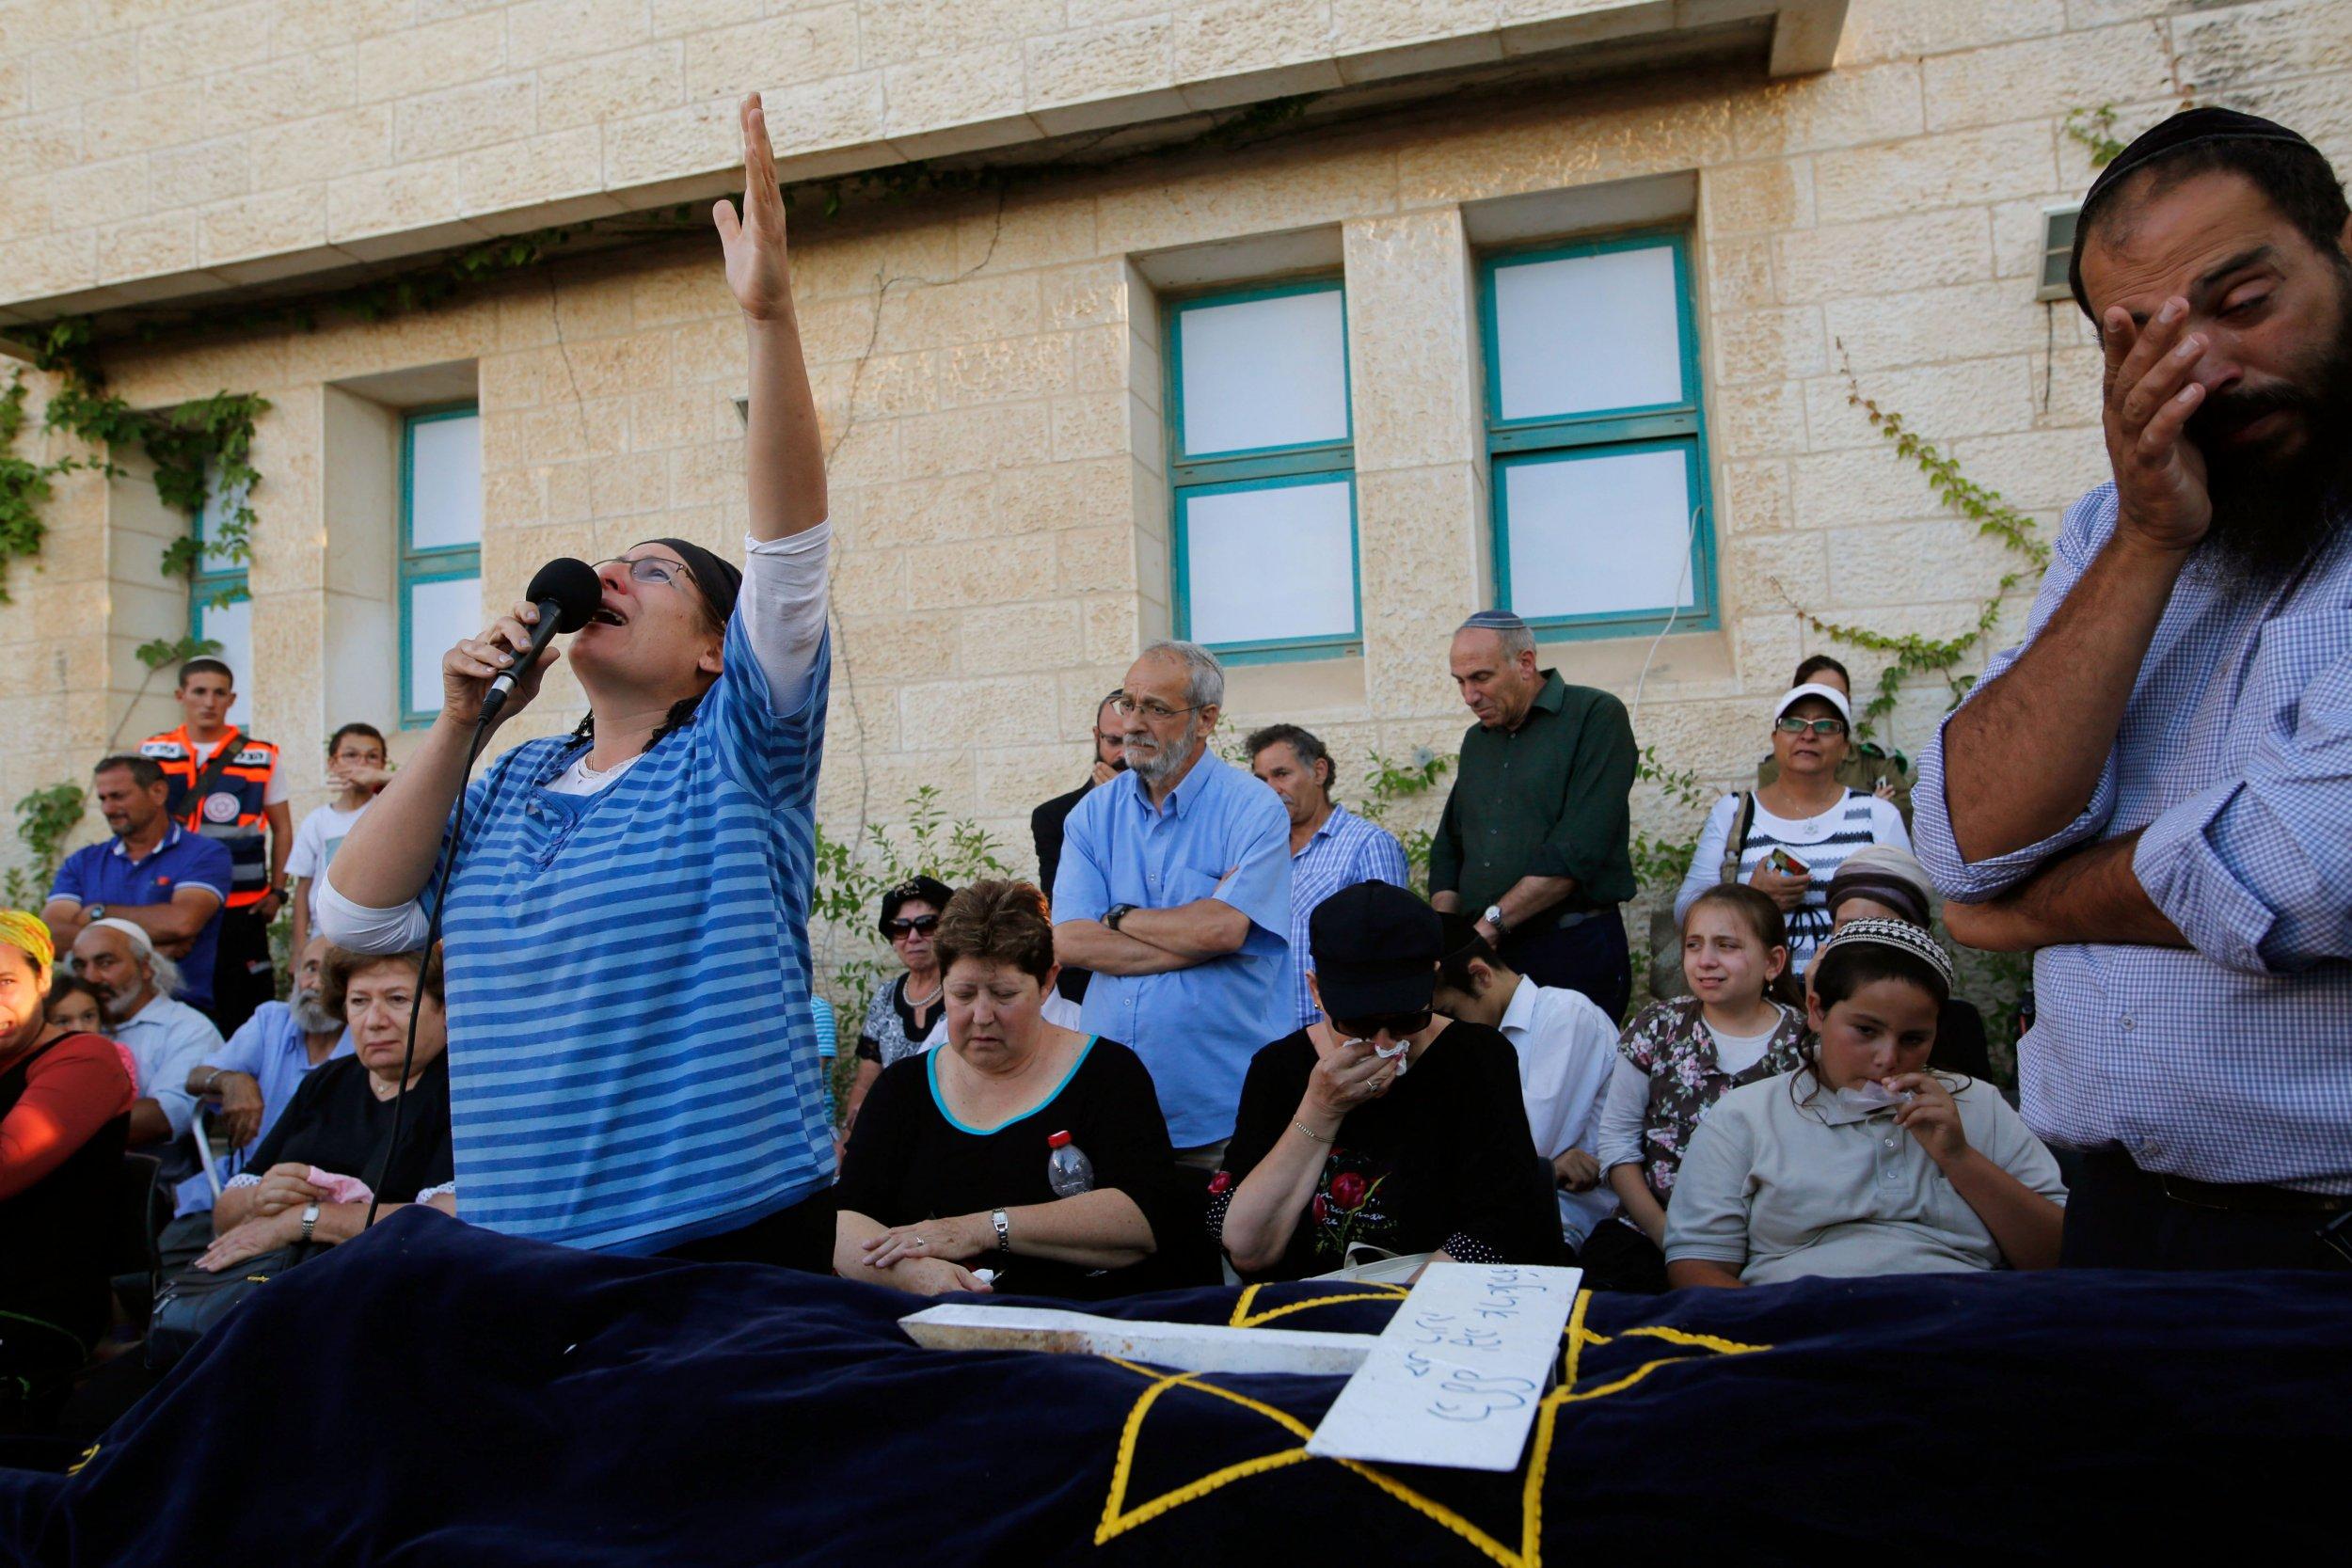 Israel stabbing attack victim's funeral